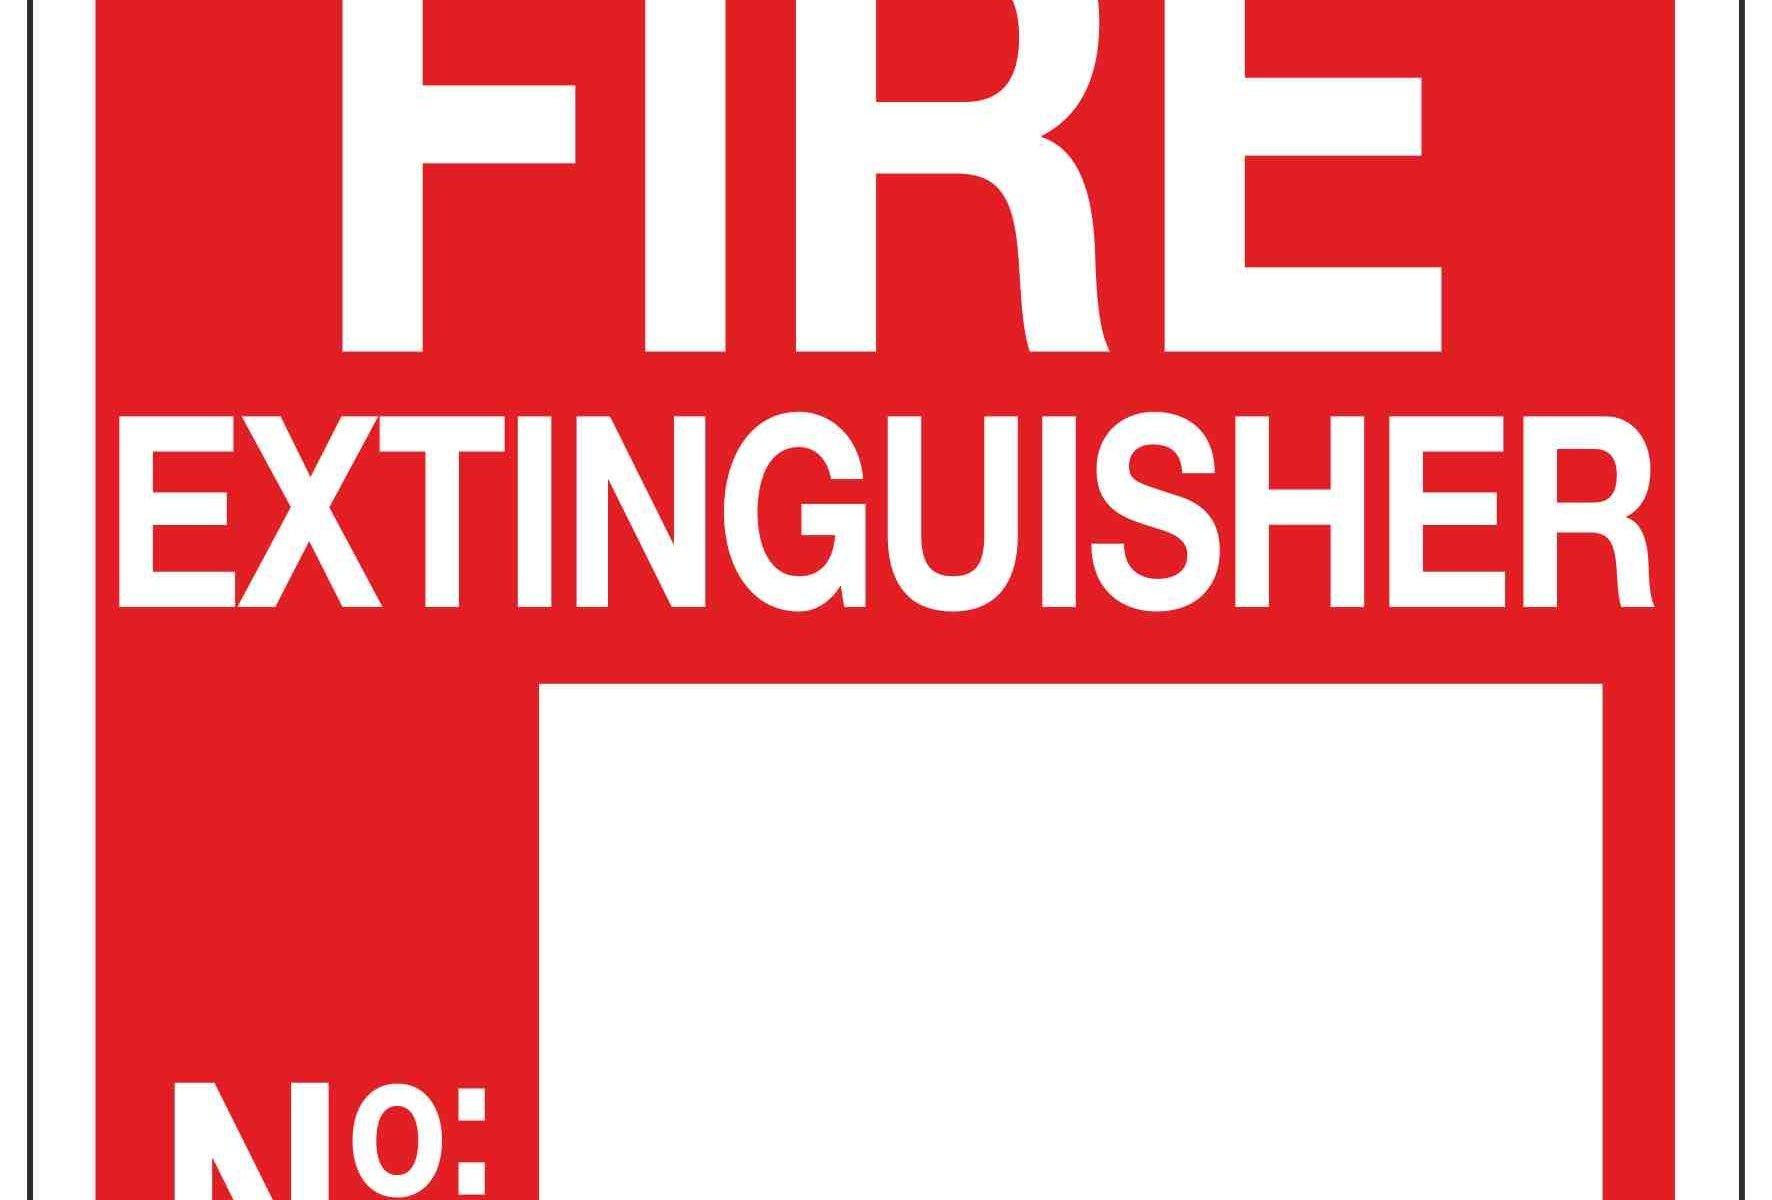 FIRE EXTINGUISHER No.